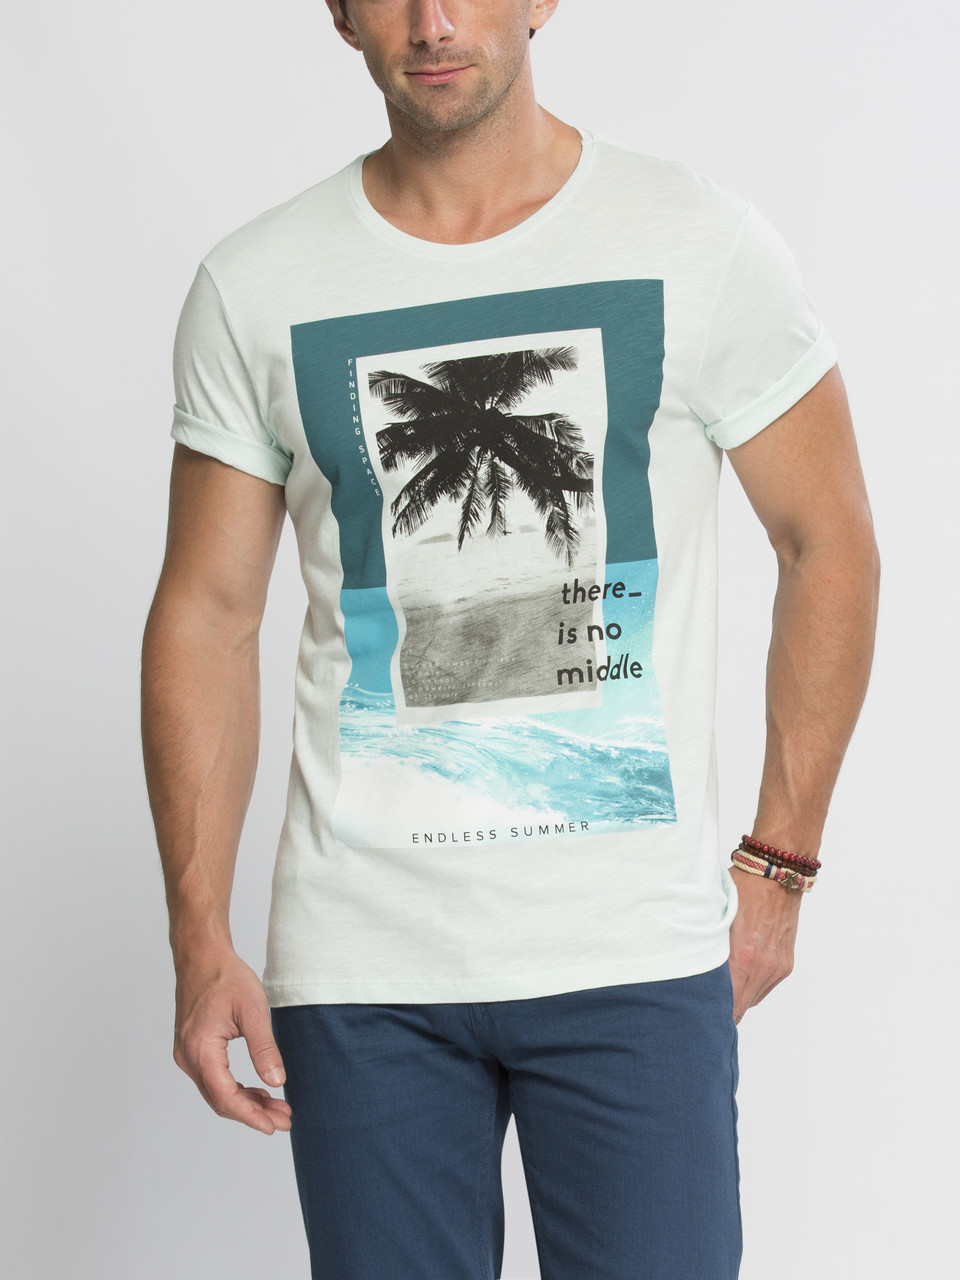 Мужская футболка мятная LC Waikiki / ЛС Вайкики с пальмой на груди